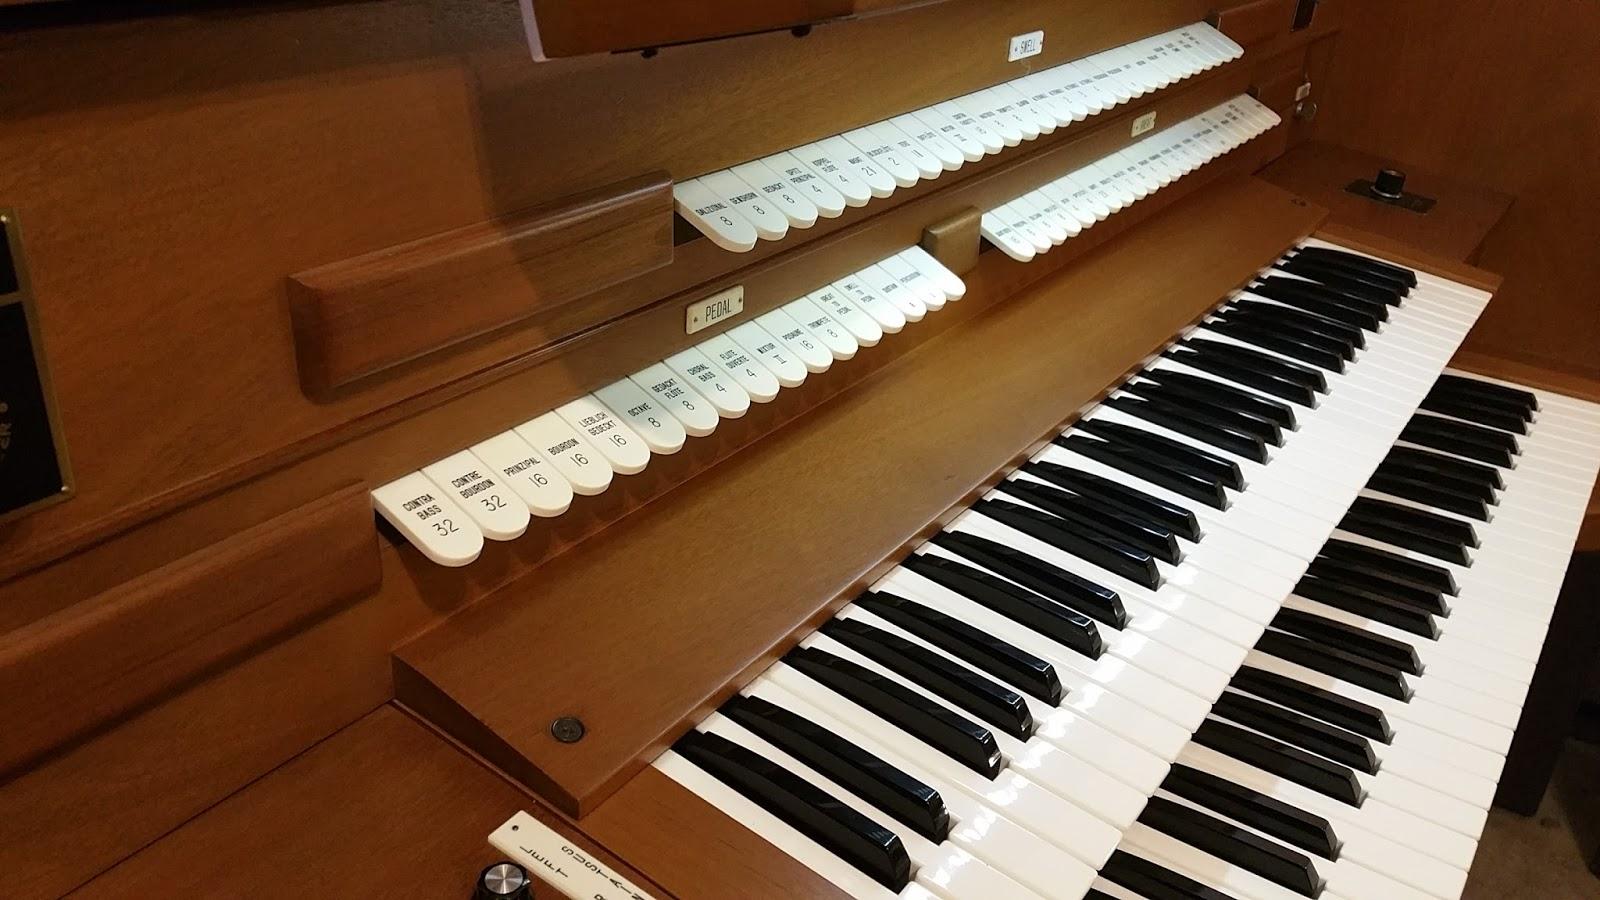 GRAFTON PIANO & ORGAN - EVENTS: ALLEN ORGANS USED FOR PAPAL